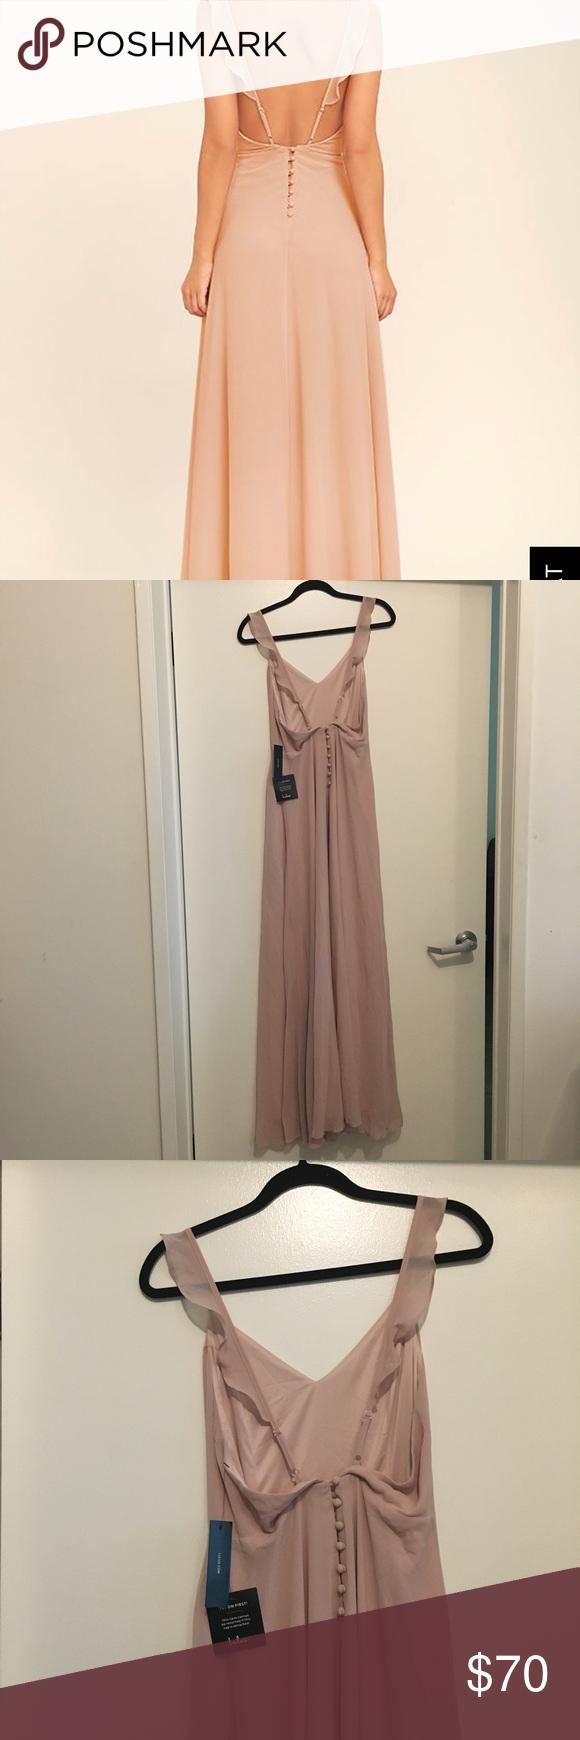 99131c374317 Lulu's Meteoric Rise Blush Maxi Dress (Large) Lulu's Meteoric Rise Blush  Maxi Dress, great bridesmaid/ wedding dress, floor length Lulu's Dresses  Maxi